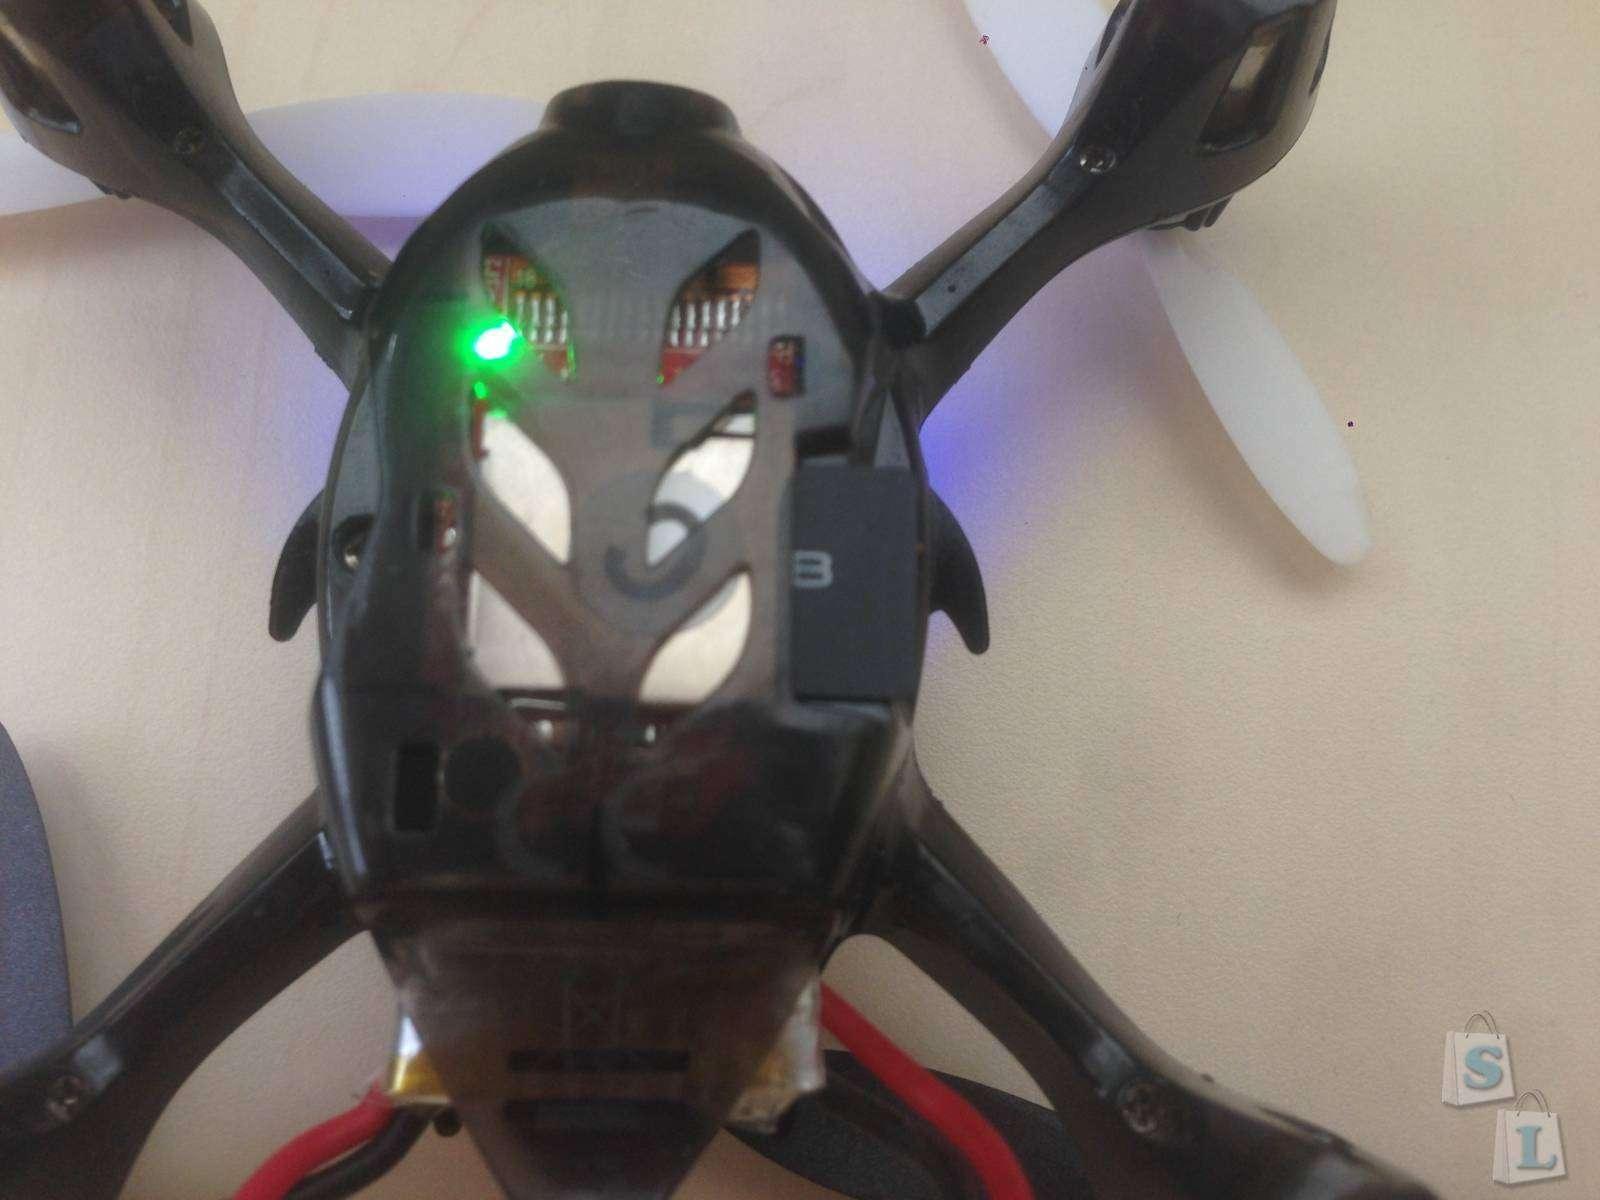 GearBest: Квадрокоптер JJRC H6C с камерой за небольшие деньги